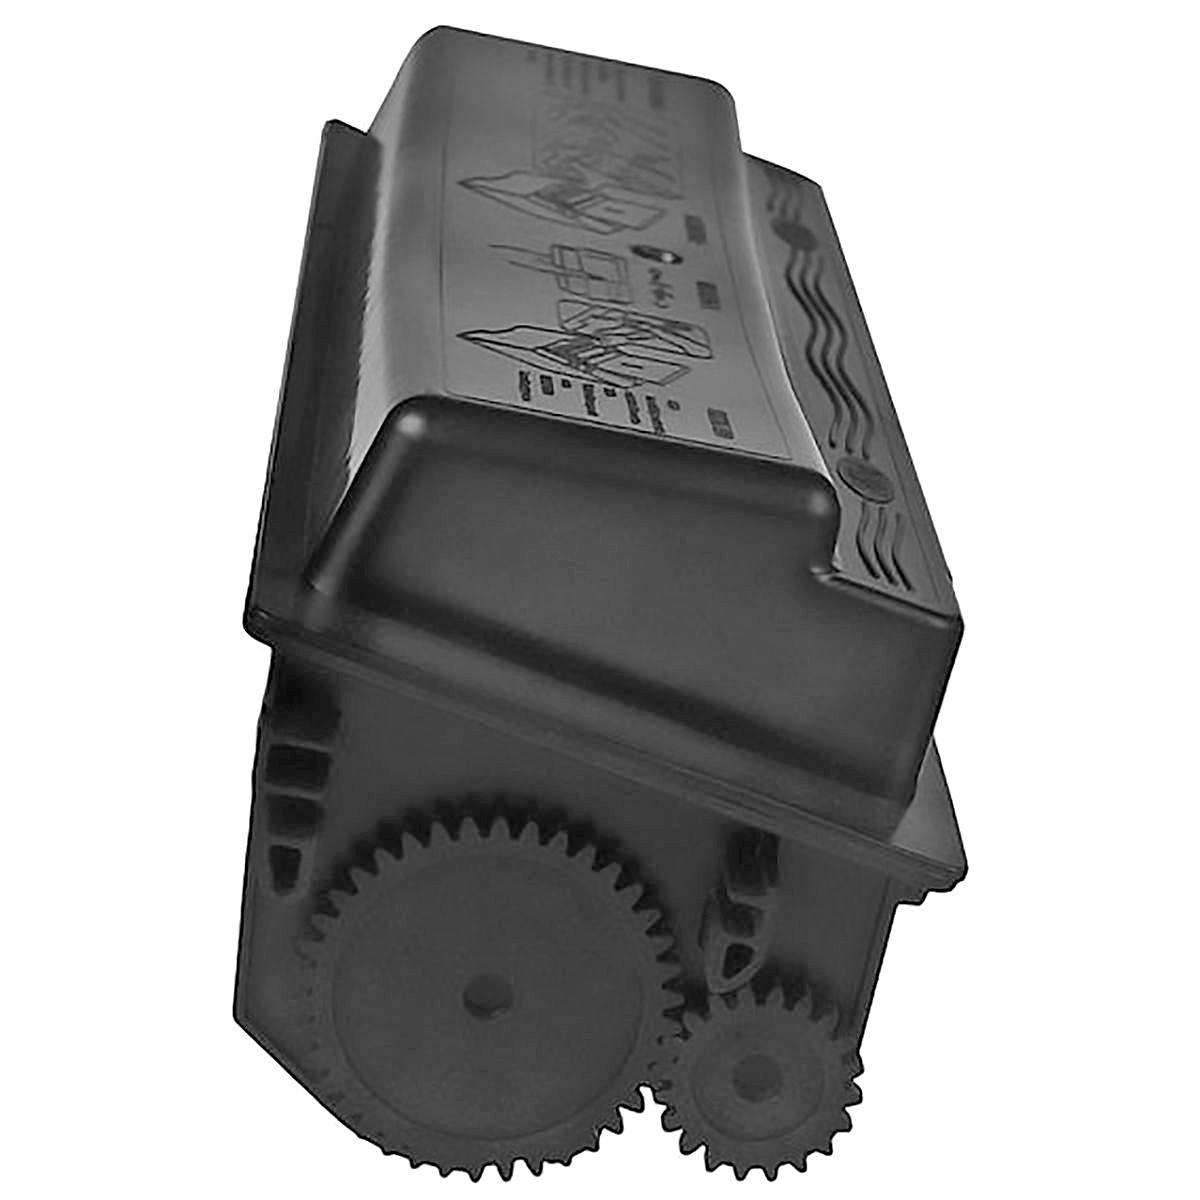 Compatível: Toner TK137 TK-137 para Kyocera KM2810 KM2820 KM2810dp KM2820dp KM-2810 KM-2810dp KM-2820 / Preto / 6.800